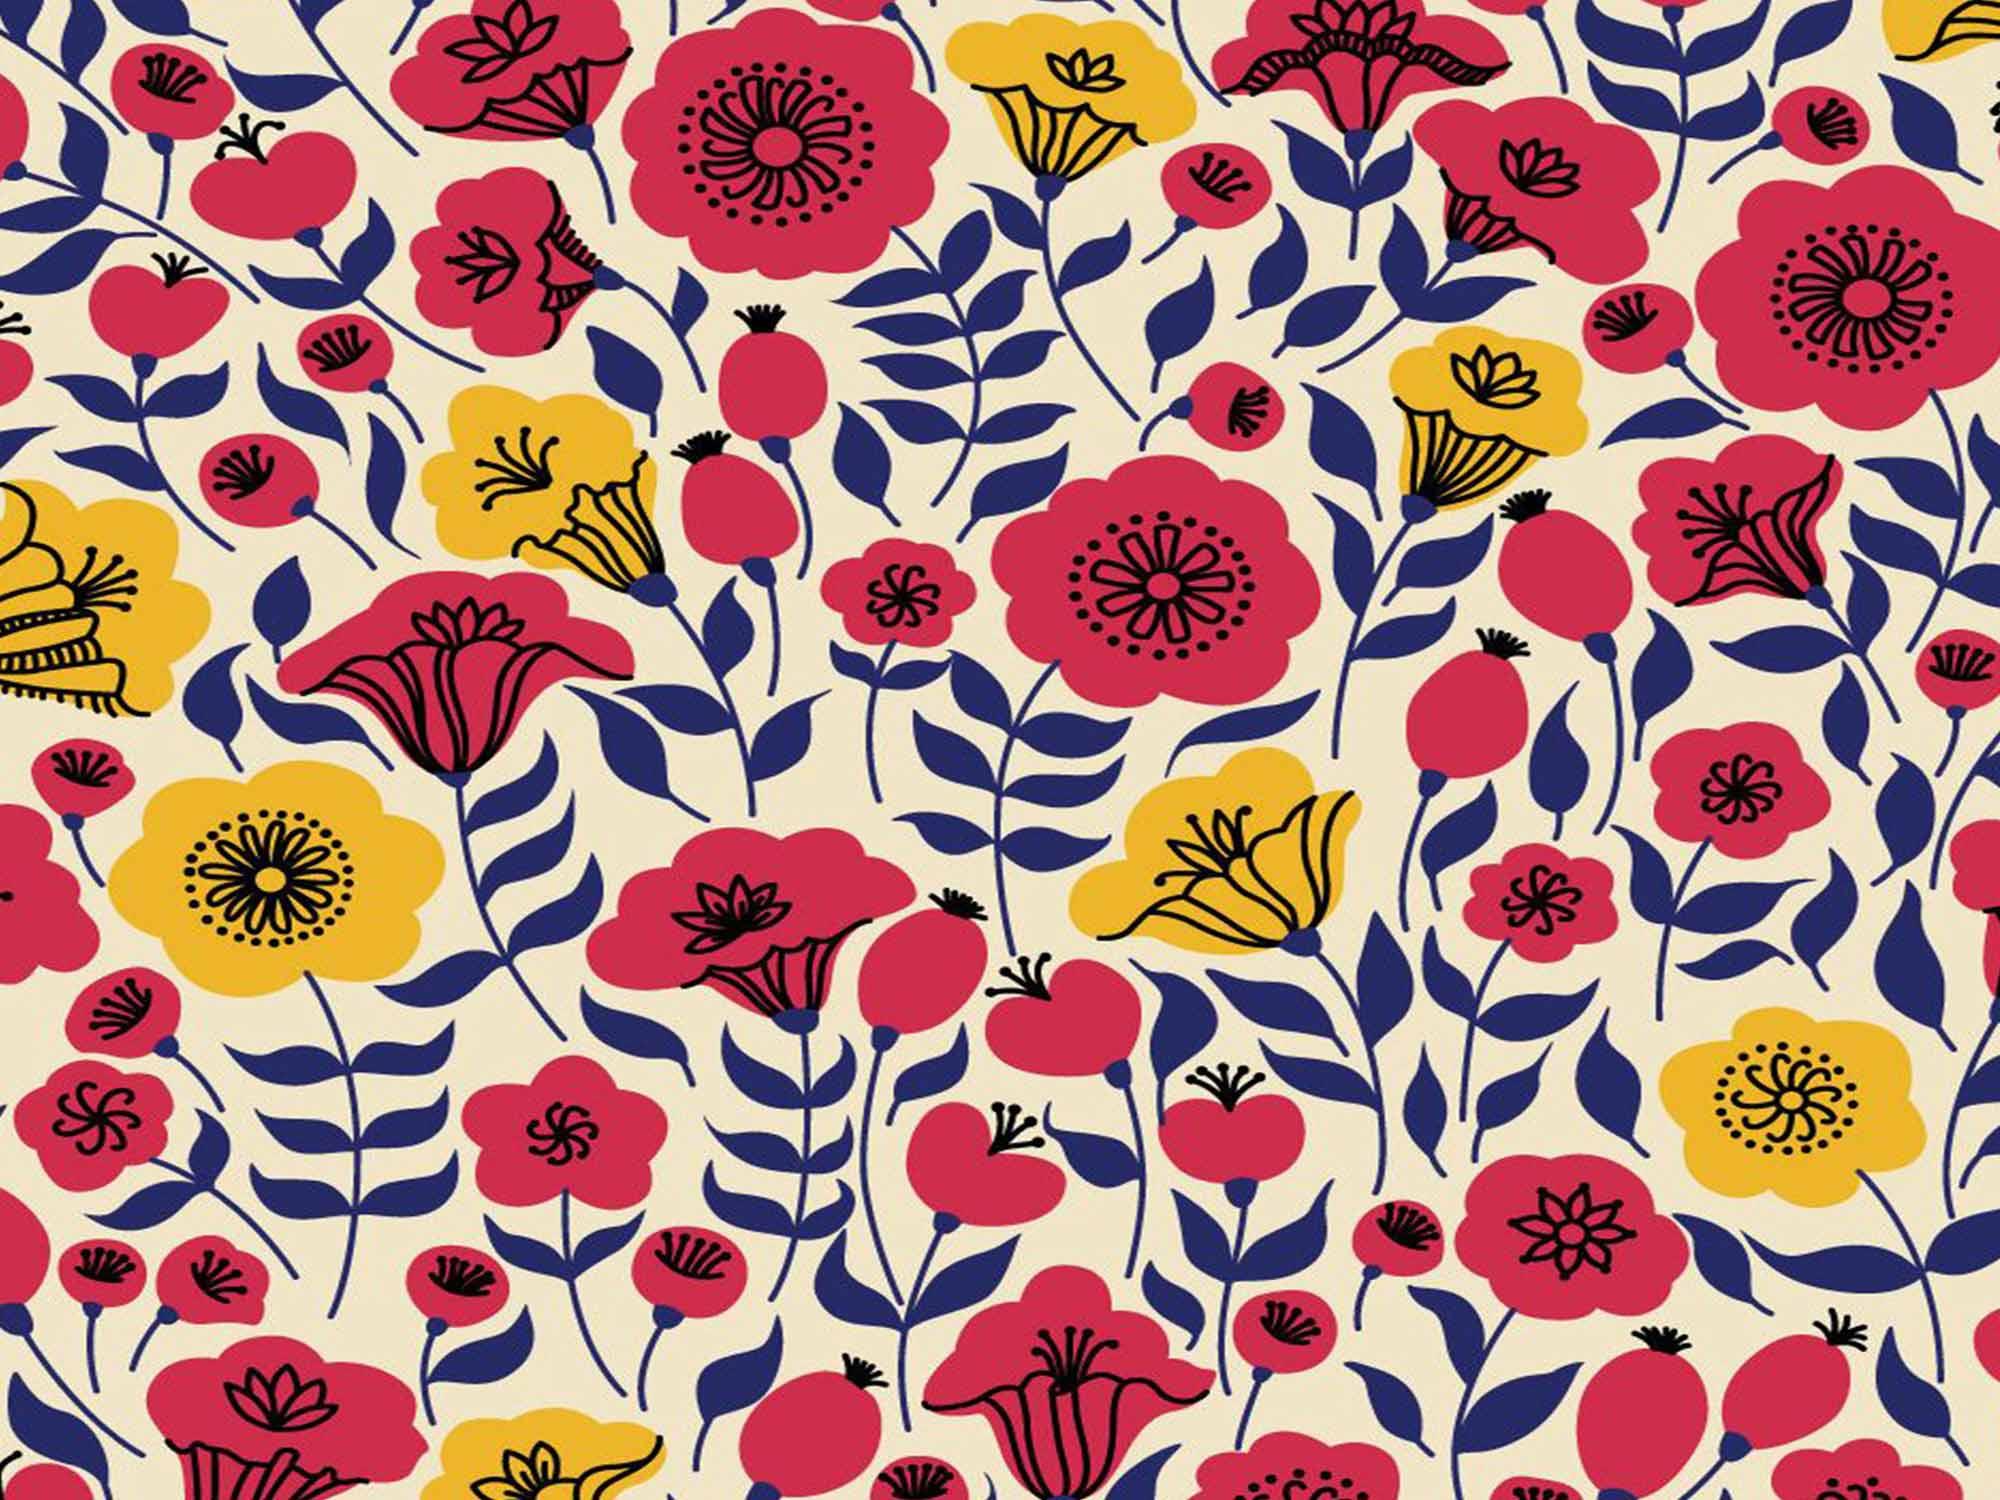 Papel de Parede Floral 0068 - Adesivos de Parede  - Paredes Decoradas